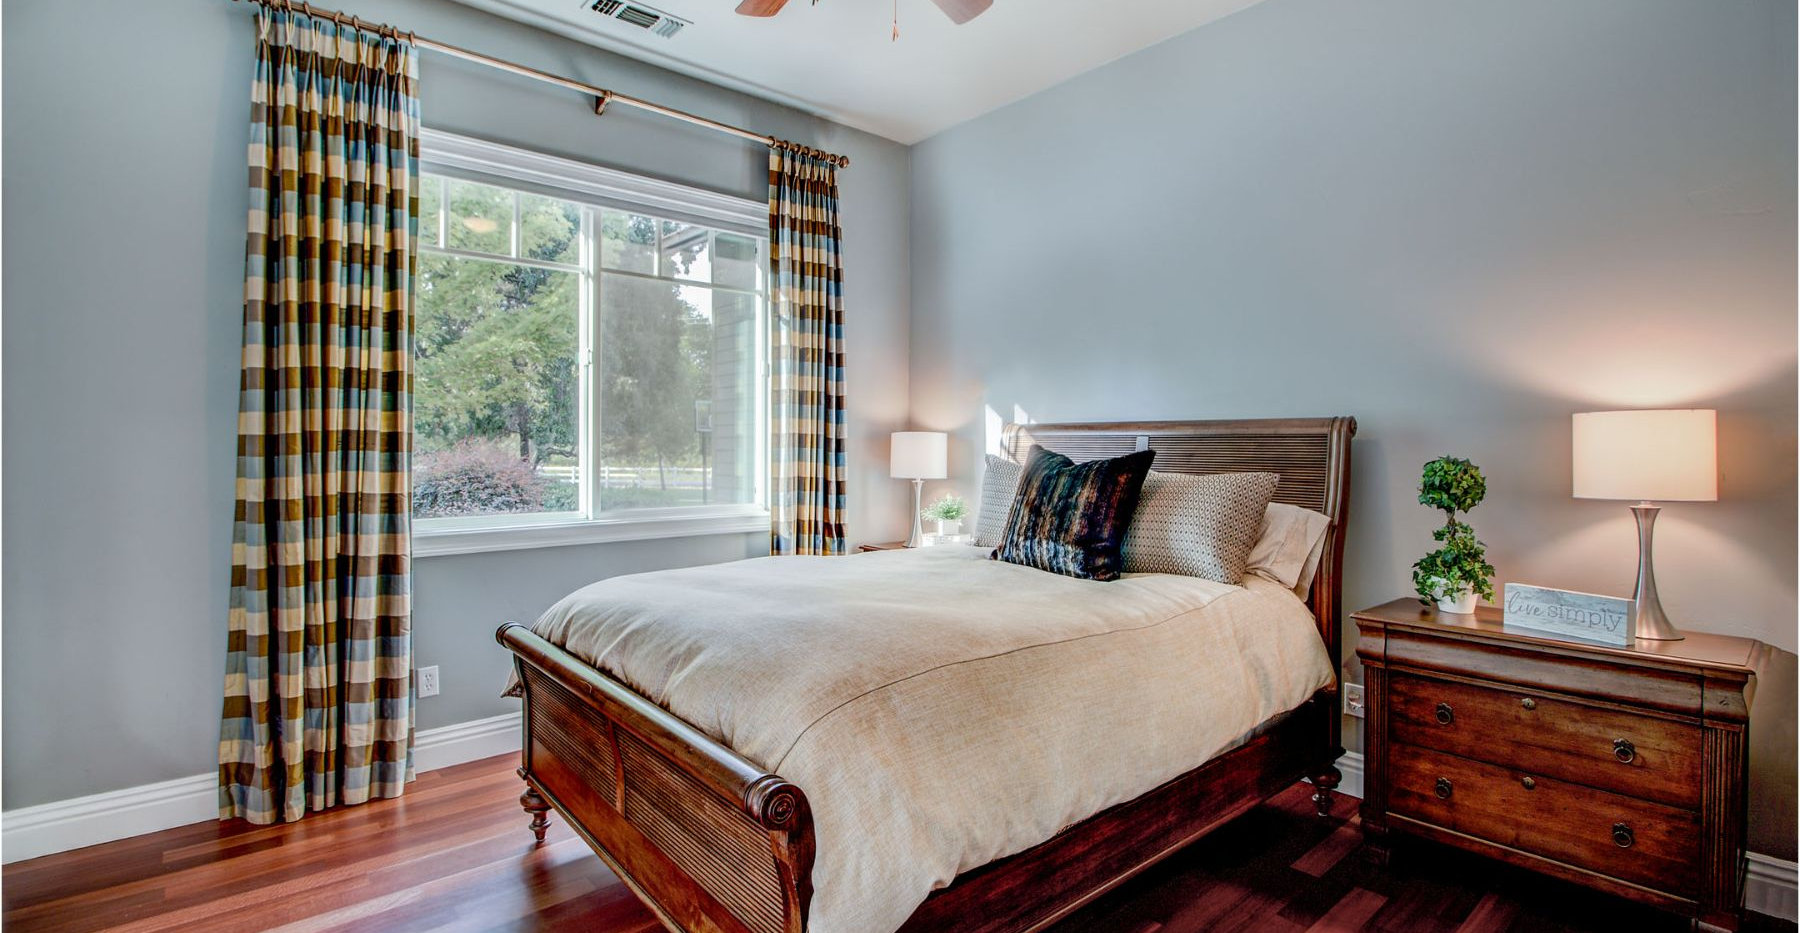 29 Bedroom.jpg